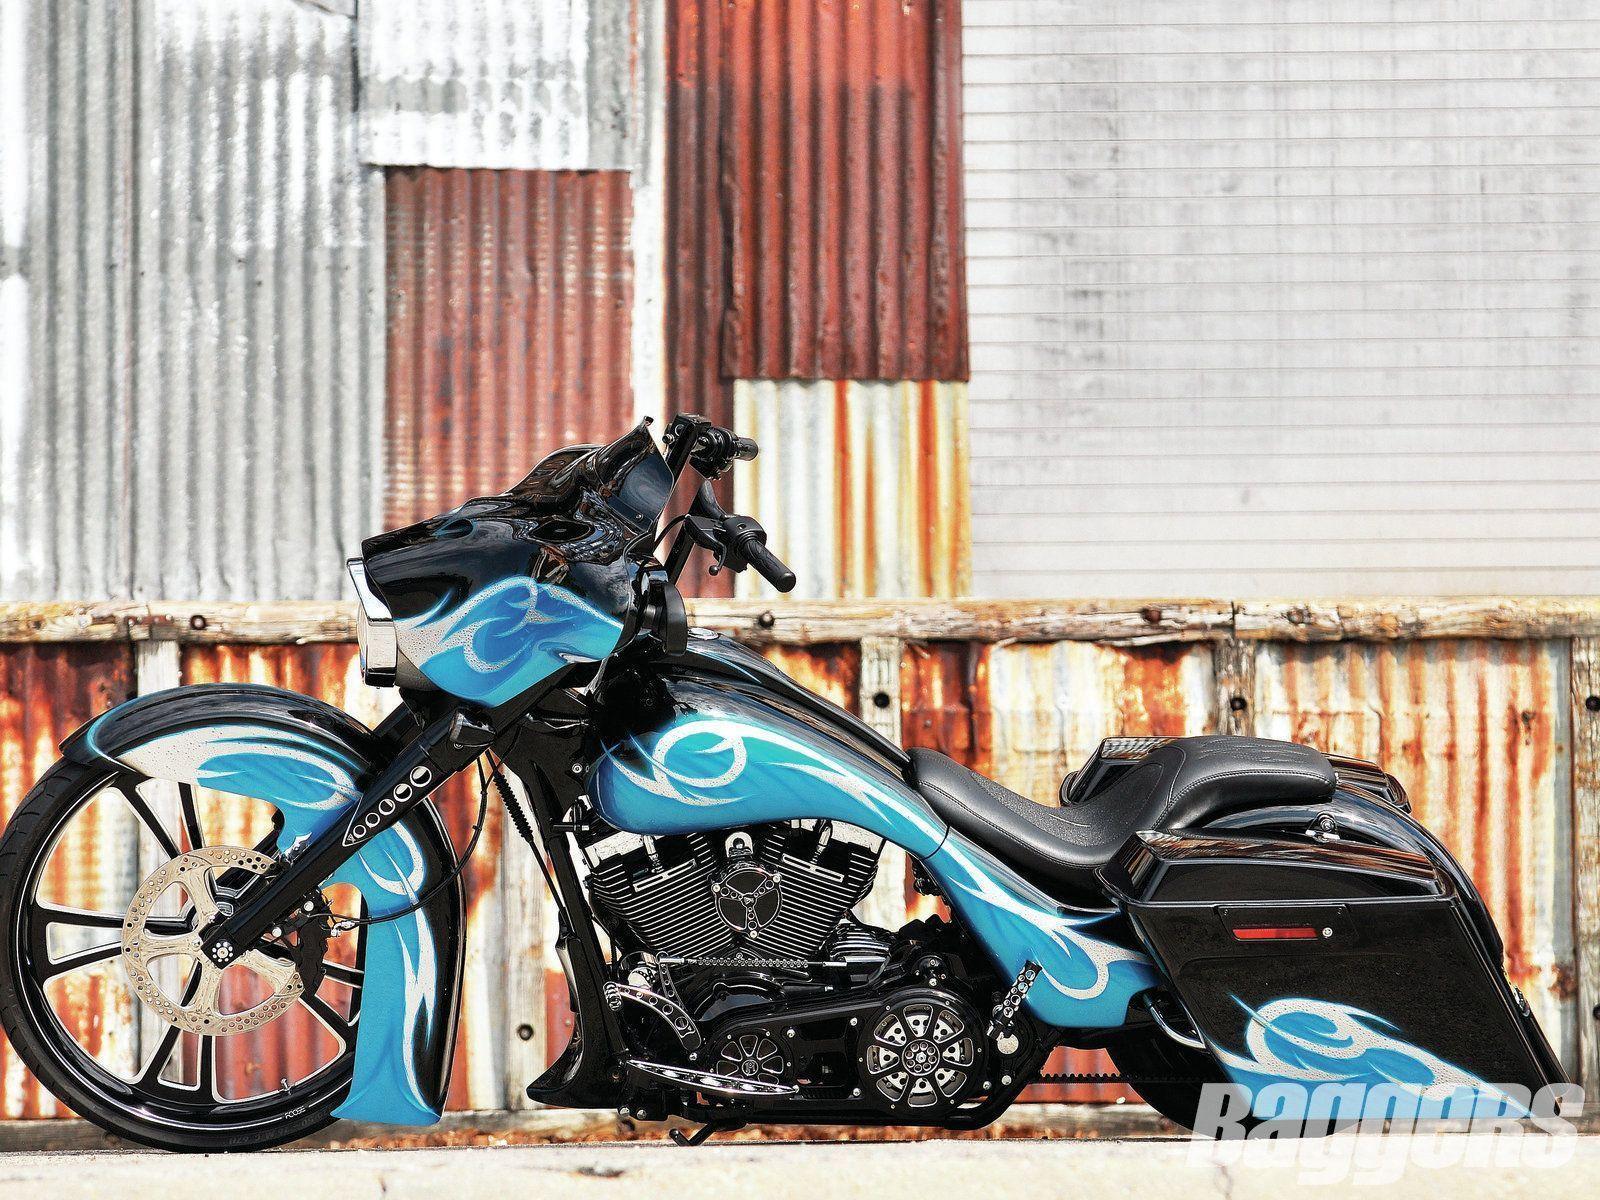 2011 Harley-Davidson Street Glide Meet local harley riders Best Dating Site for harley davidson singles http://www.harleydavidsonsingles.com #harleydavidsonstreetglidespecial #harleydavidsonglide